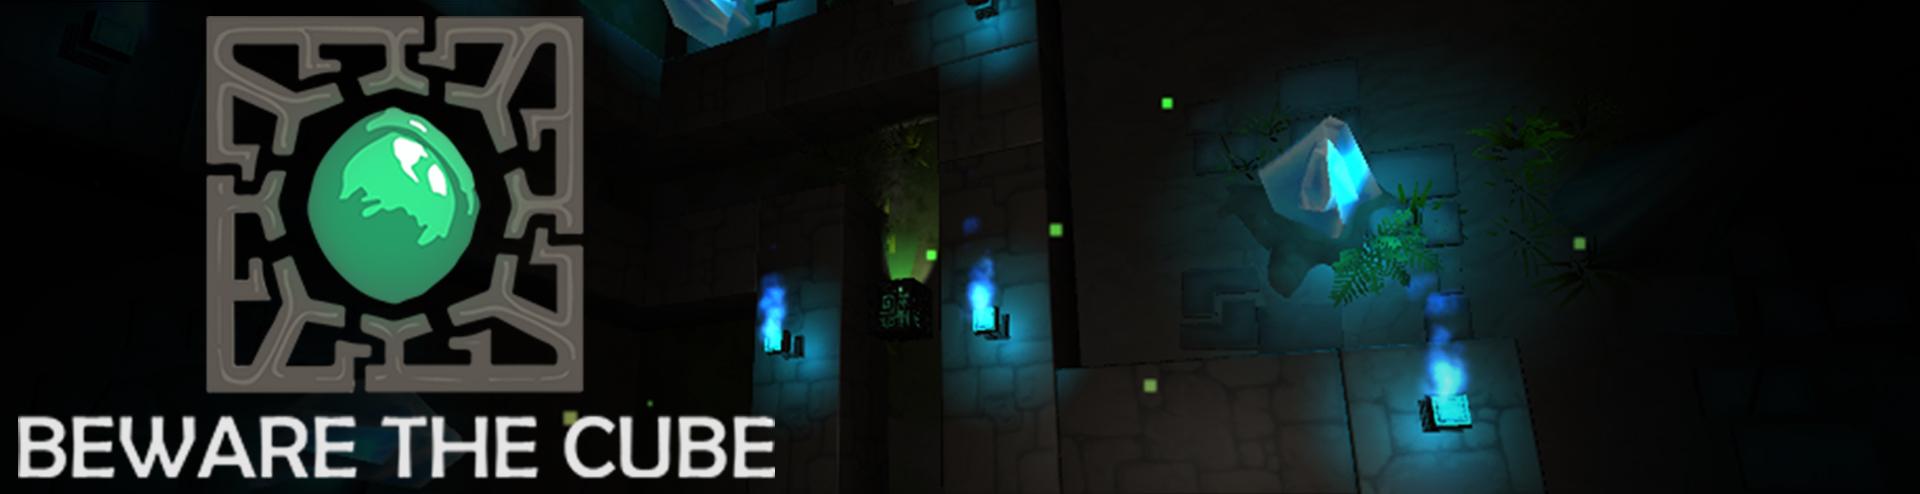 Beware the cube